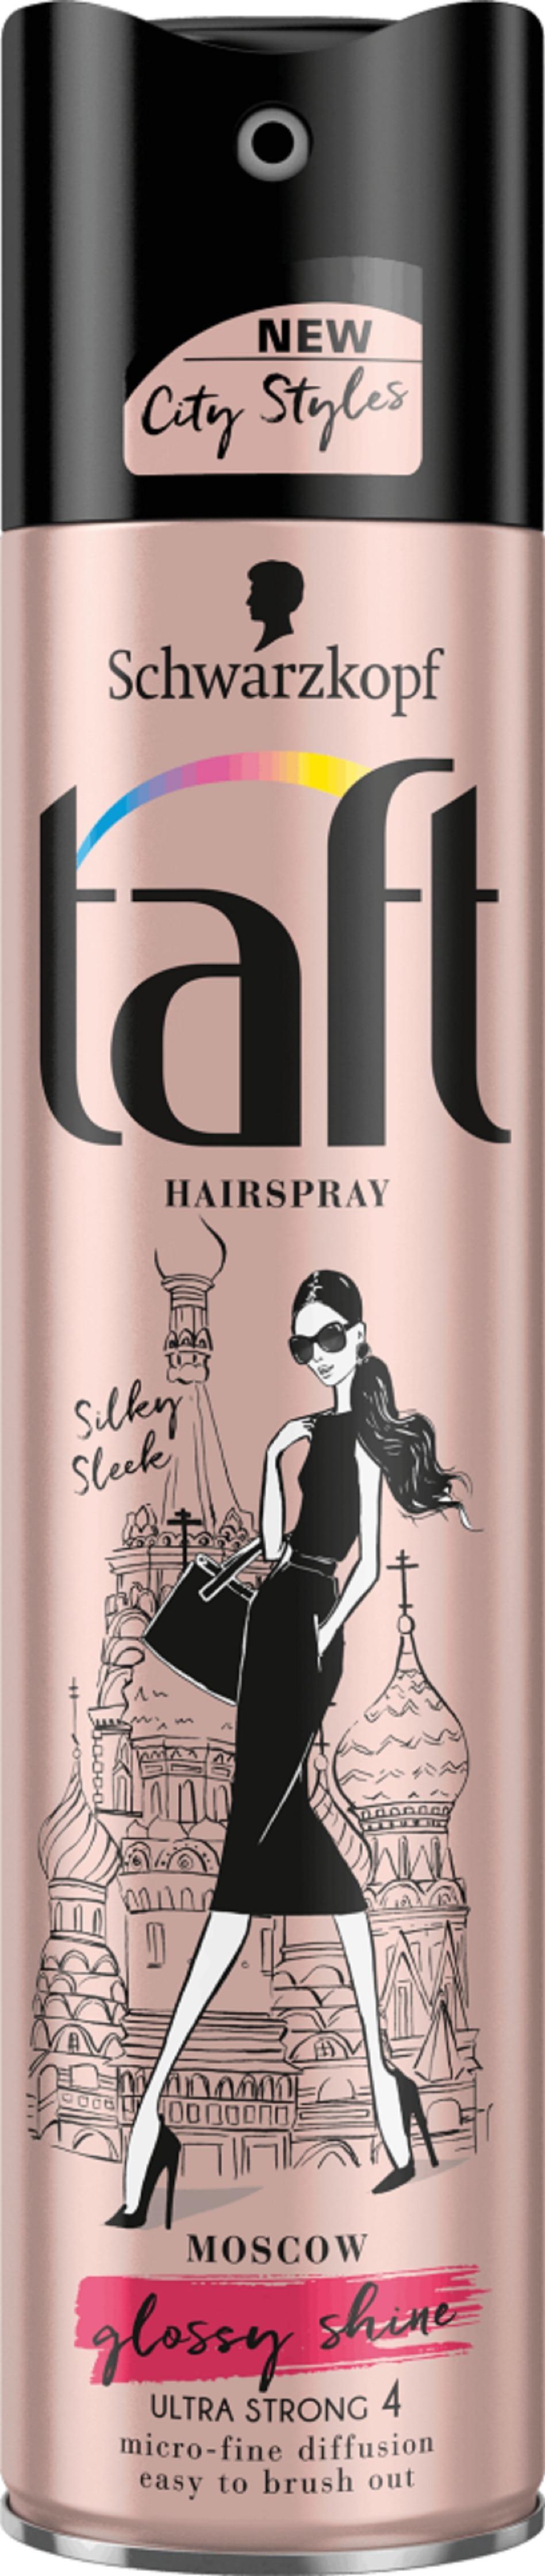 Taft City Styles Moscow Silky Sleek Glossy Shine ultra silná fixace 4 lak na vlasy 250 ml